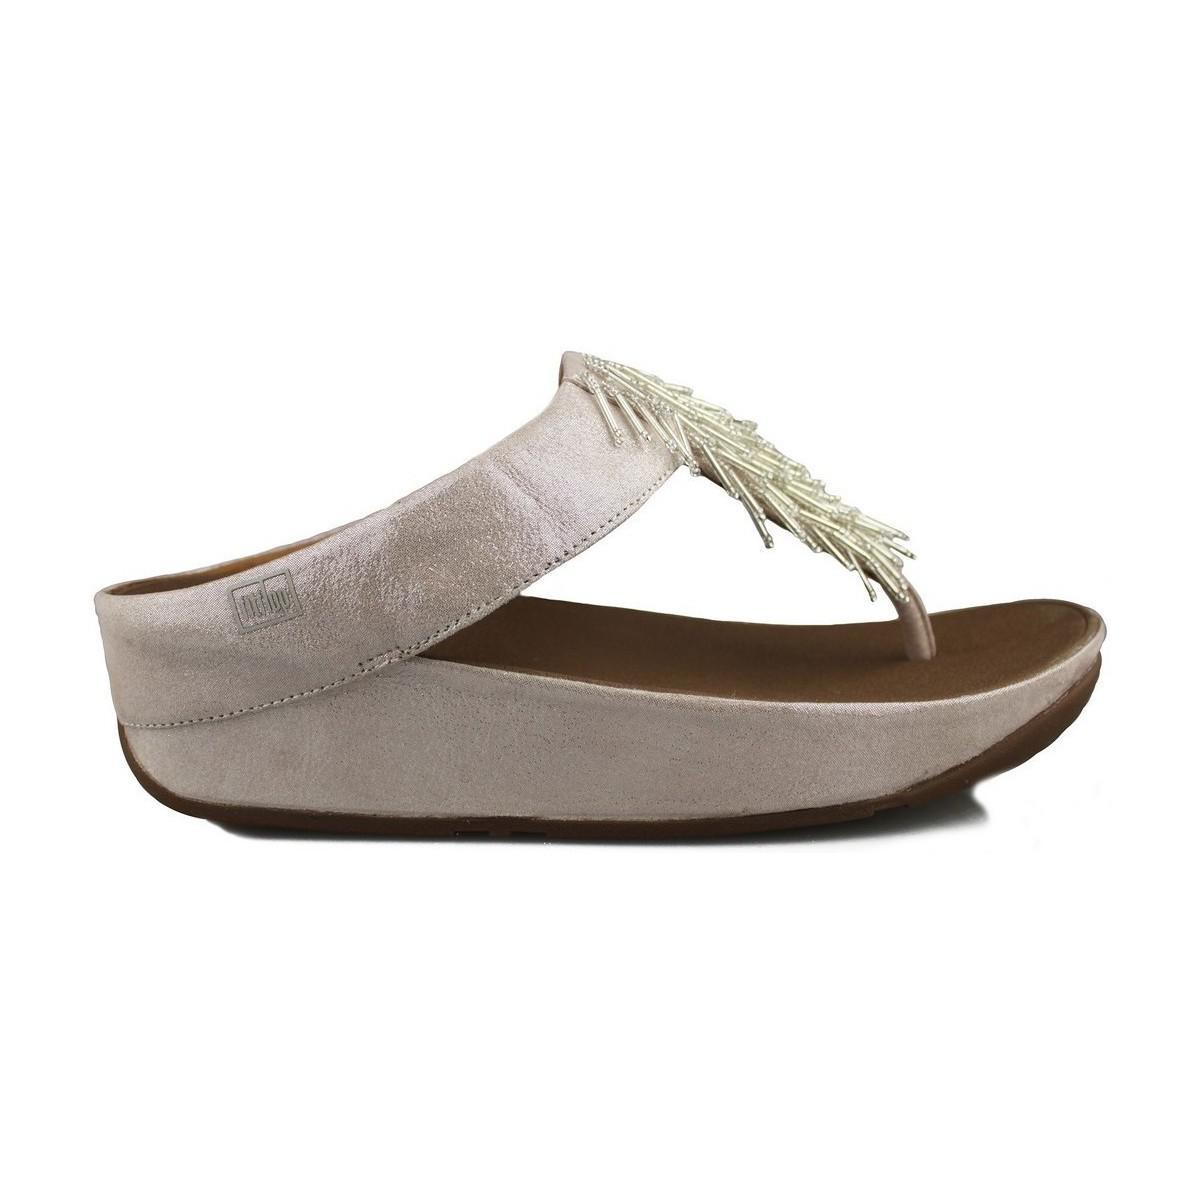 85d64384ffbf Fitflop - Cha Cha Women s Flip Flops   Sandals (shoes) In Pink - Lyst. View  fullscreen